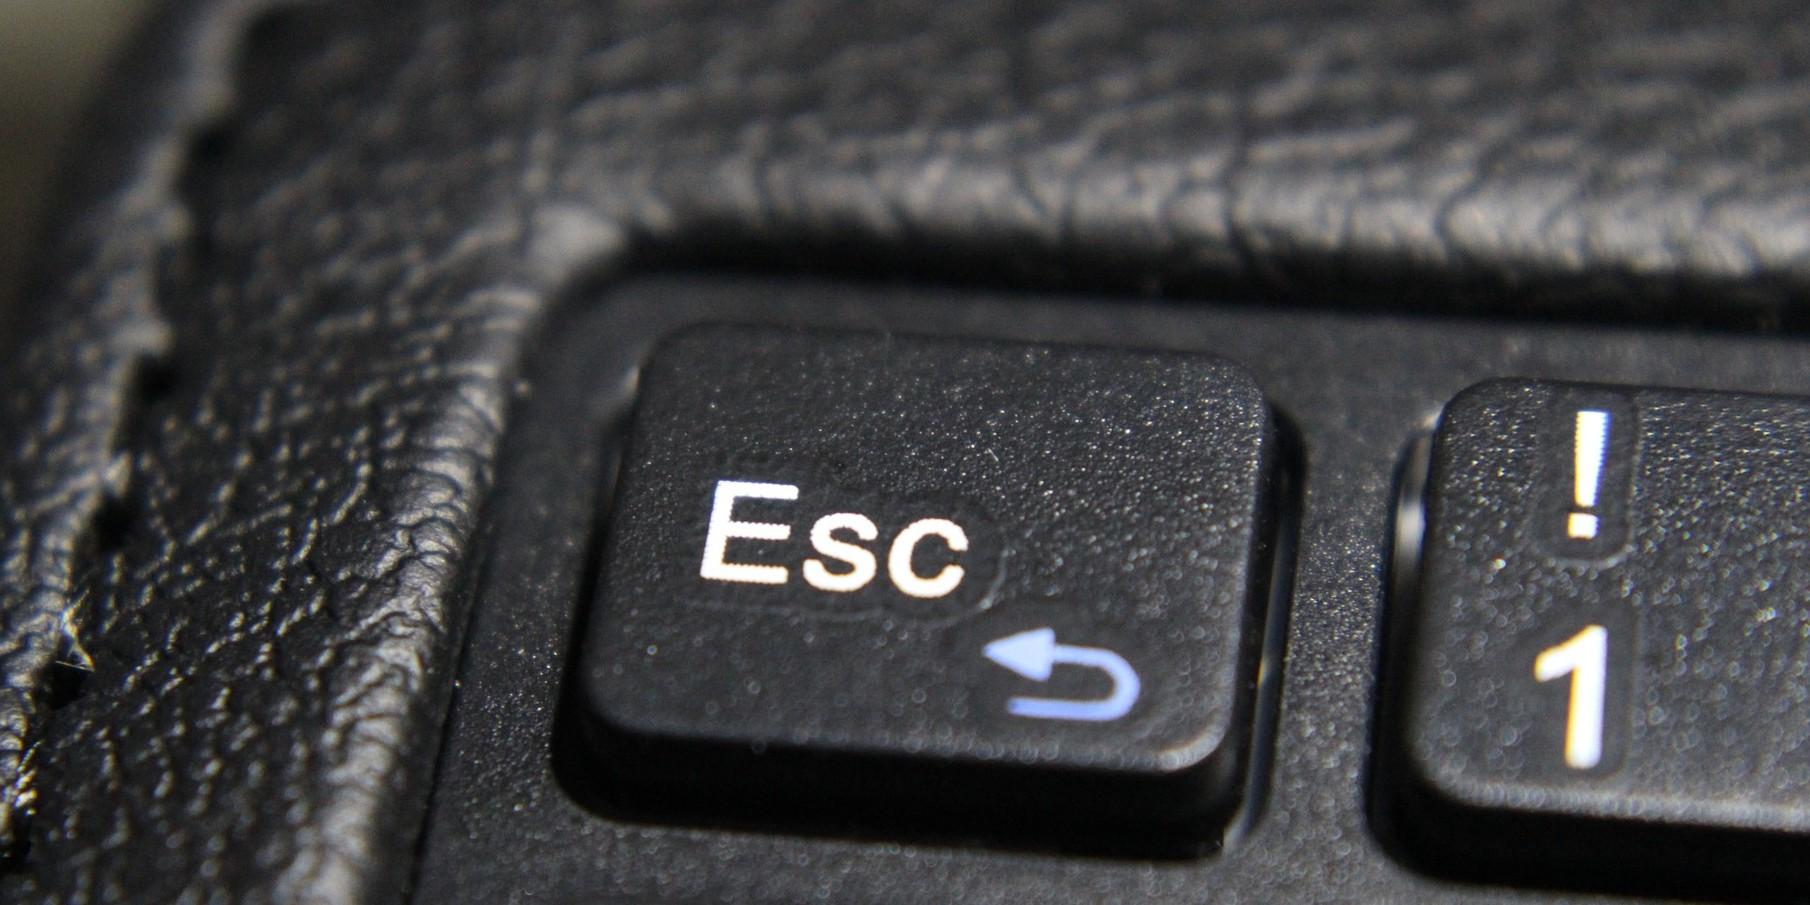 Tastatur esc image by silvia stoedter cc0 public domain via pixabay